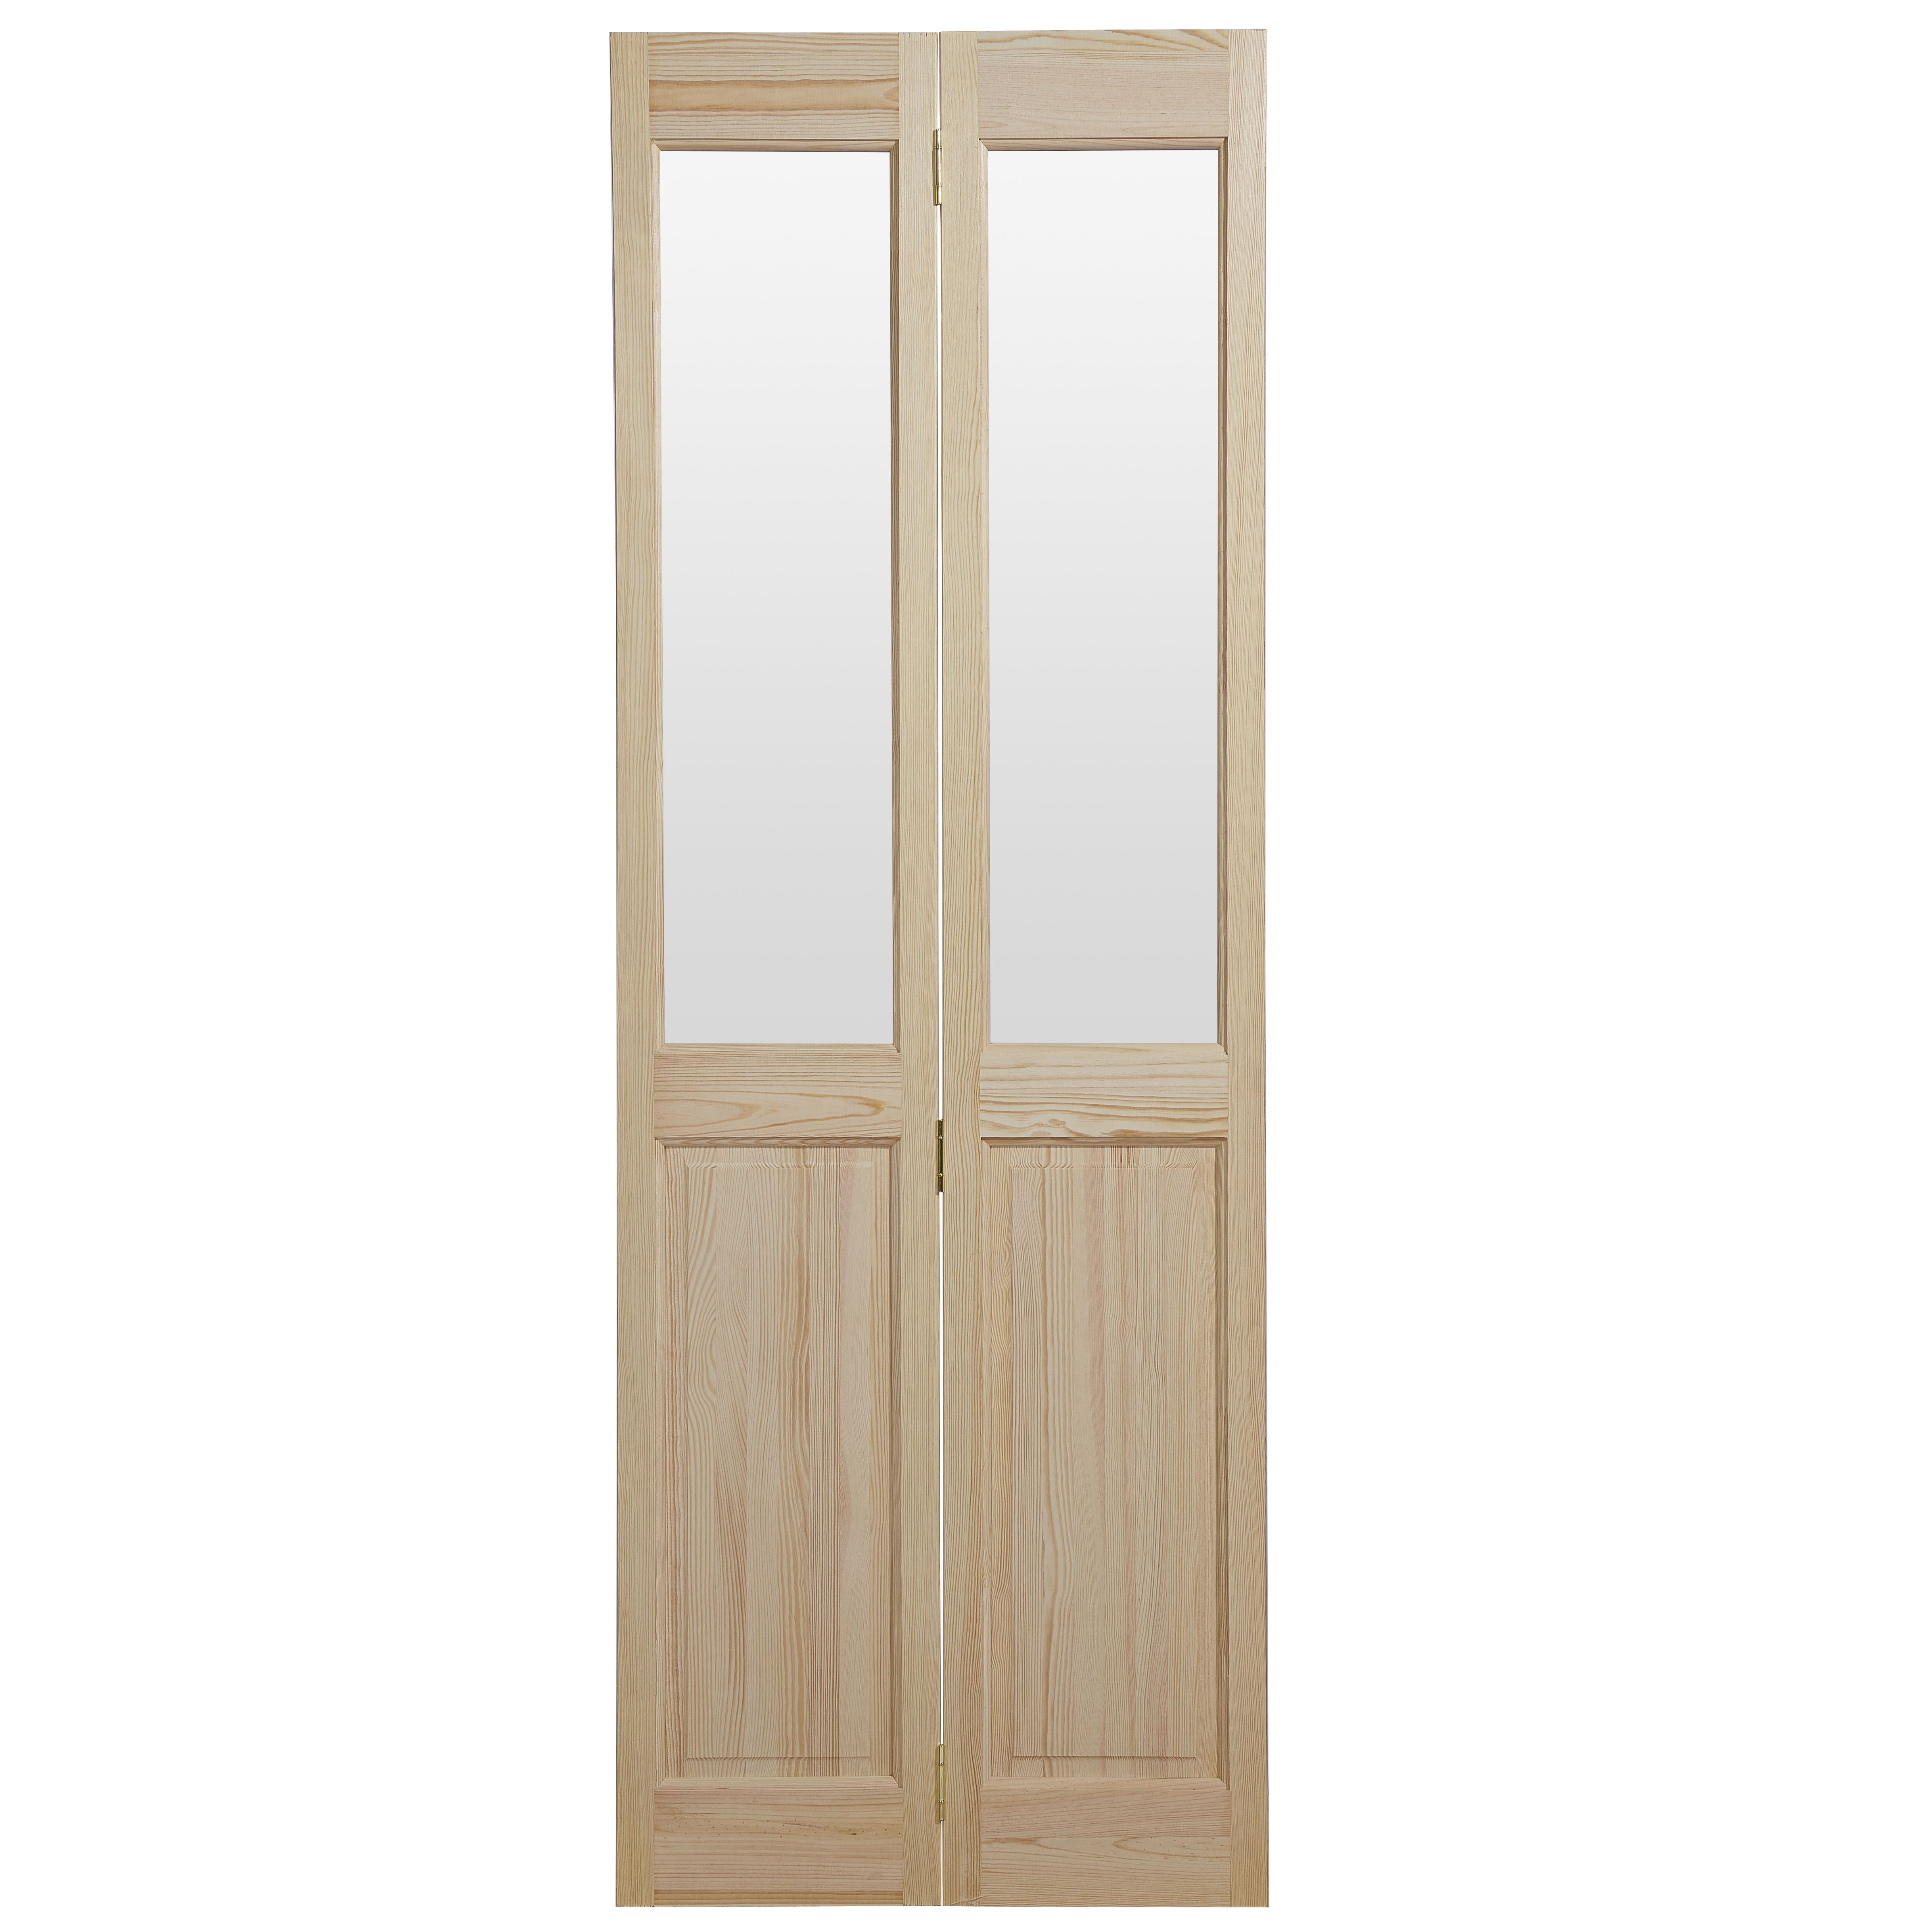 Images of Internal Bi Fold Doors Glasgow - Woonv.com - Handle idea